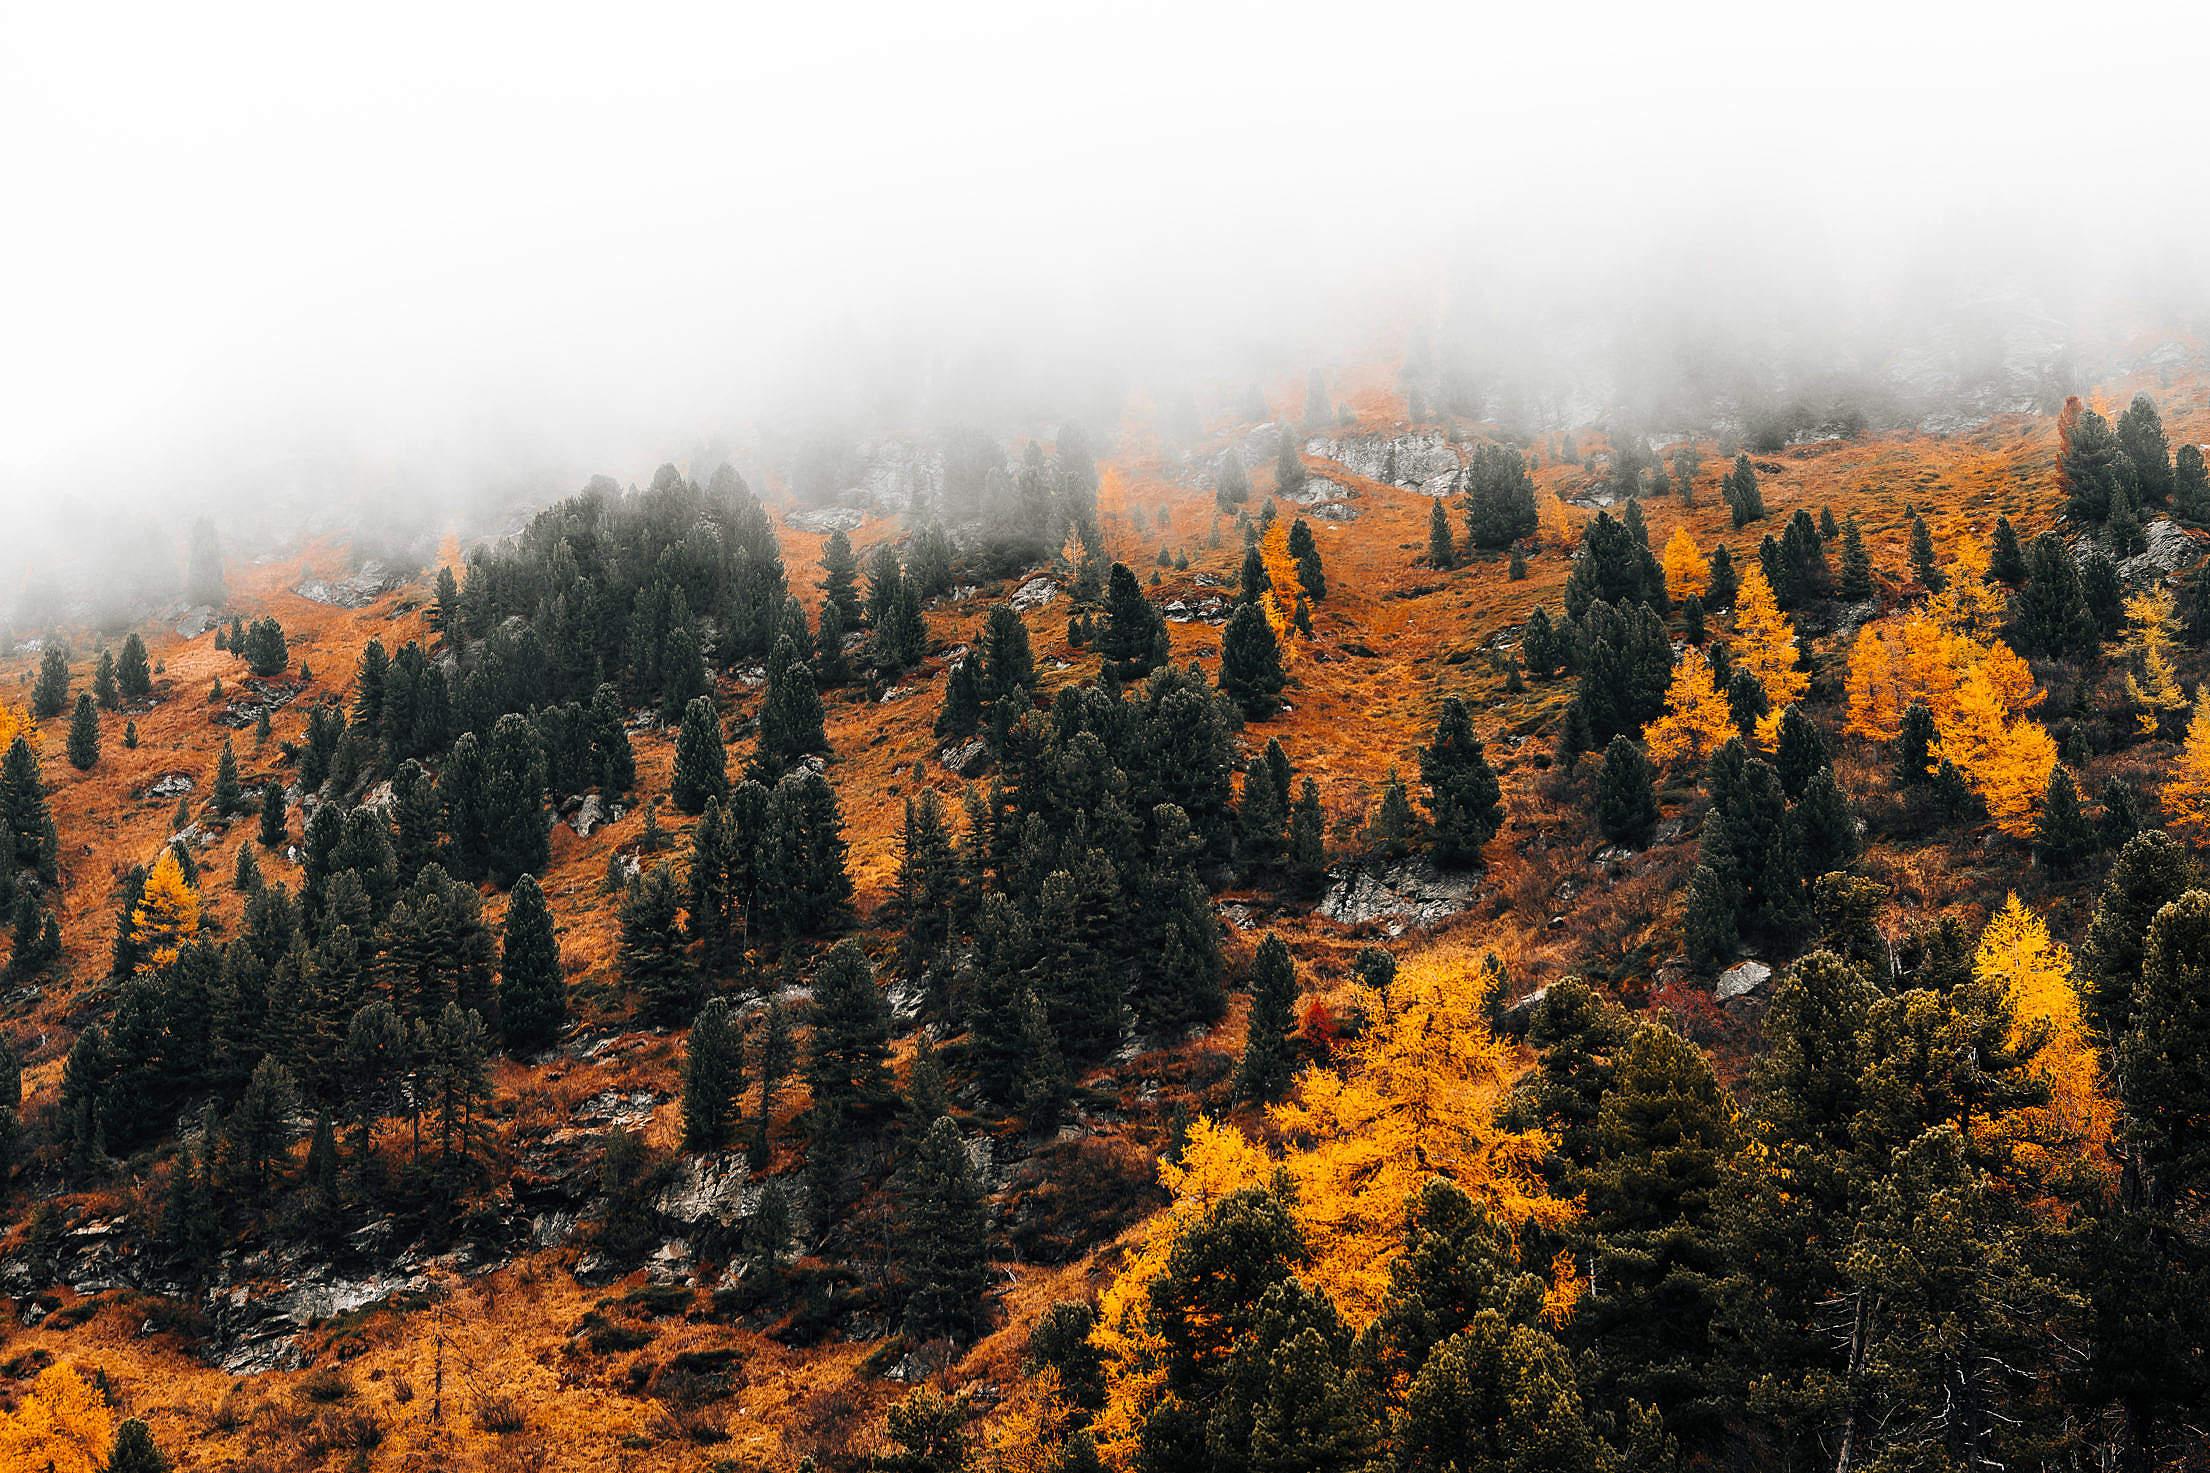 Mountain Hidden in a Fog, Autumn in Austria Free Stock Photo